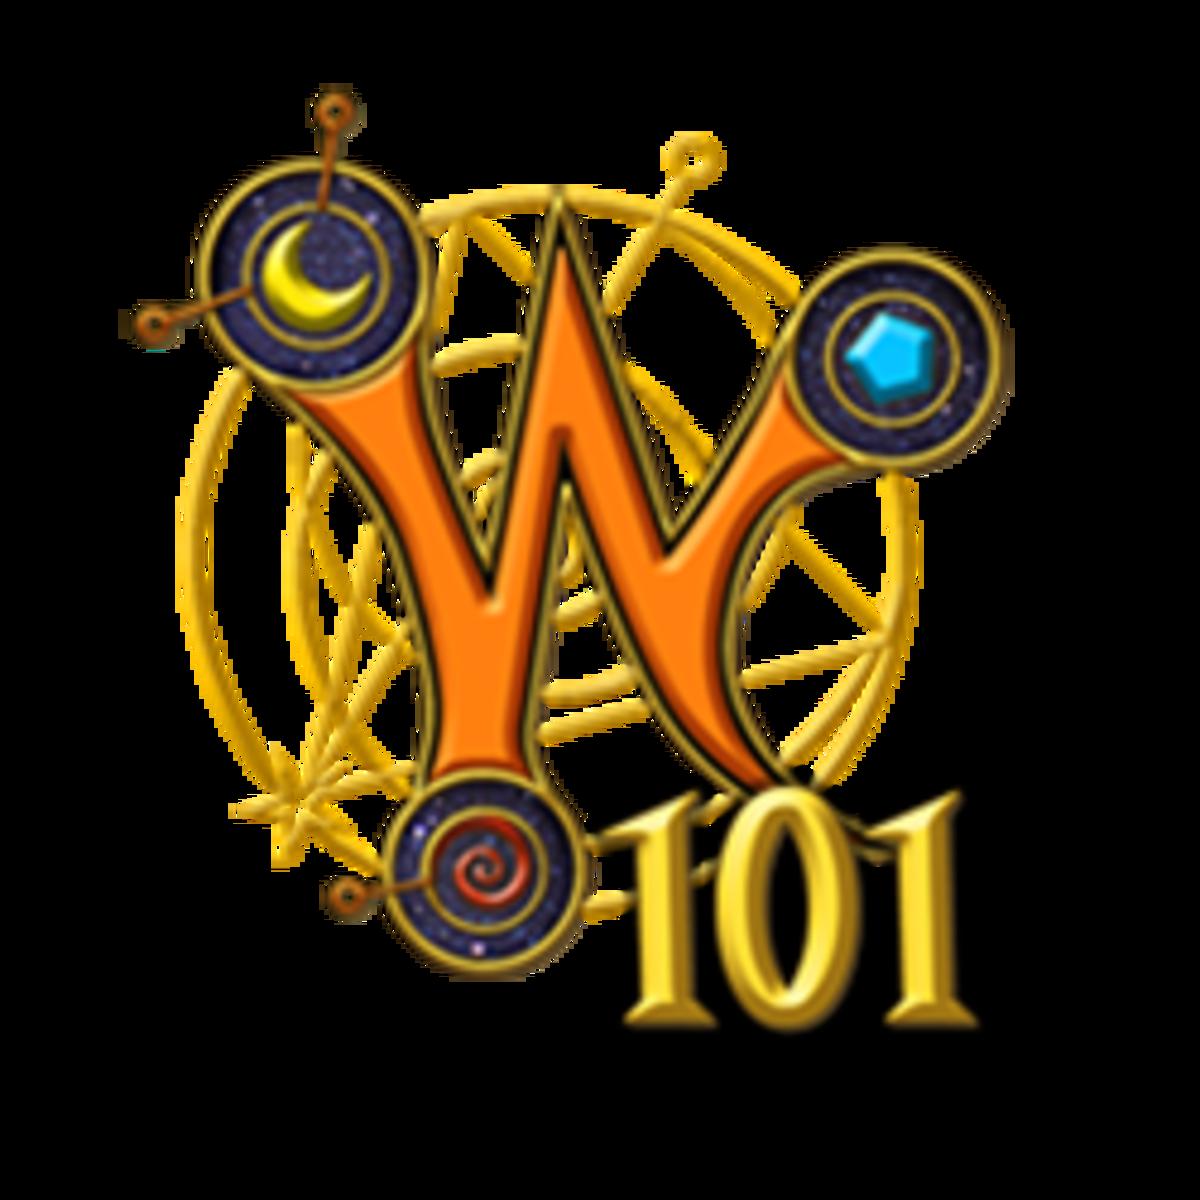 wizard101-logo